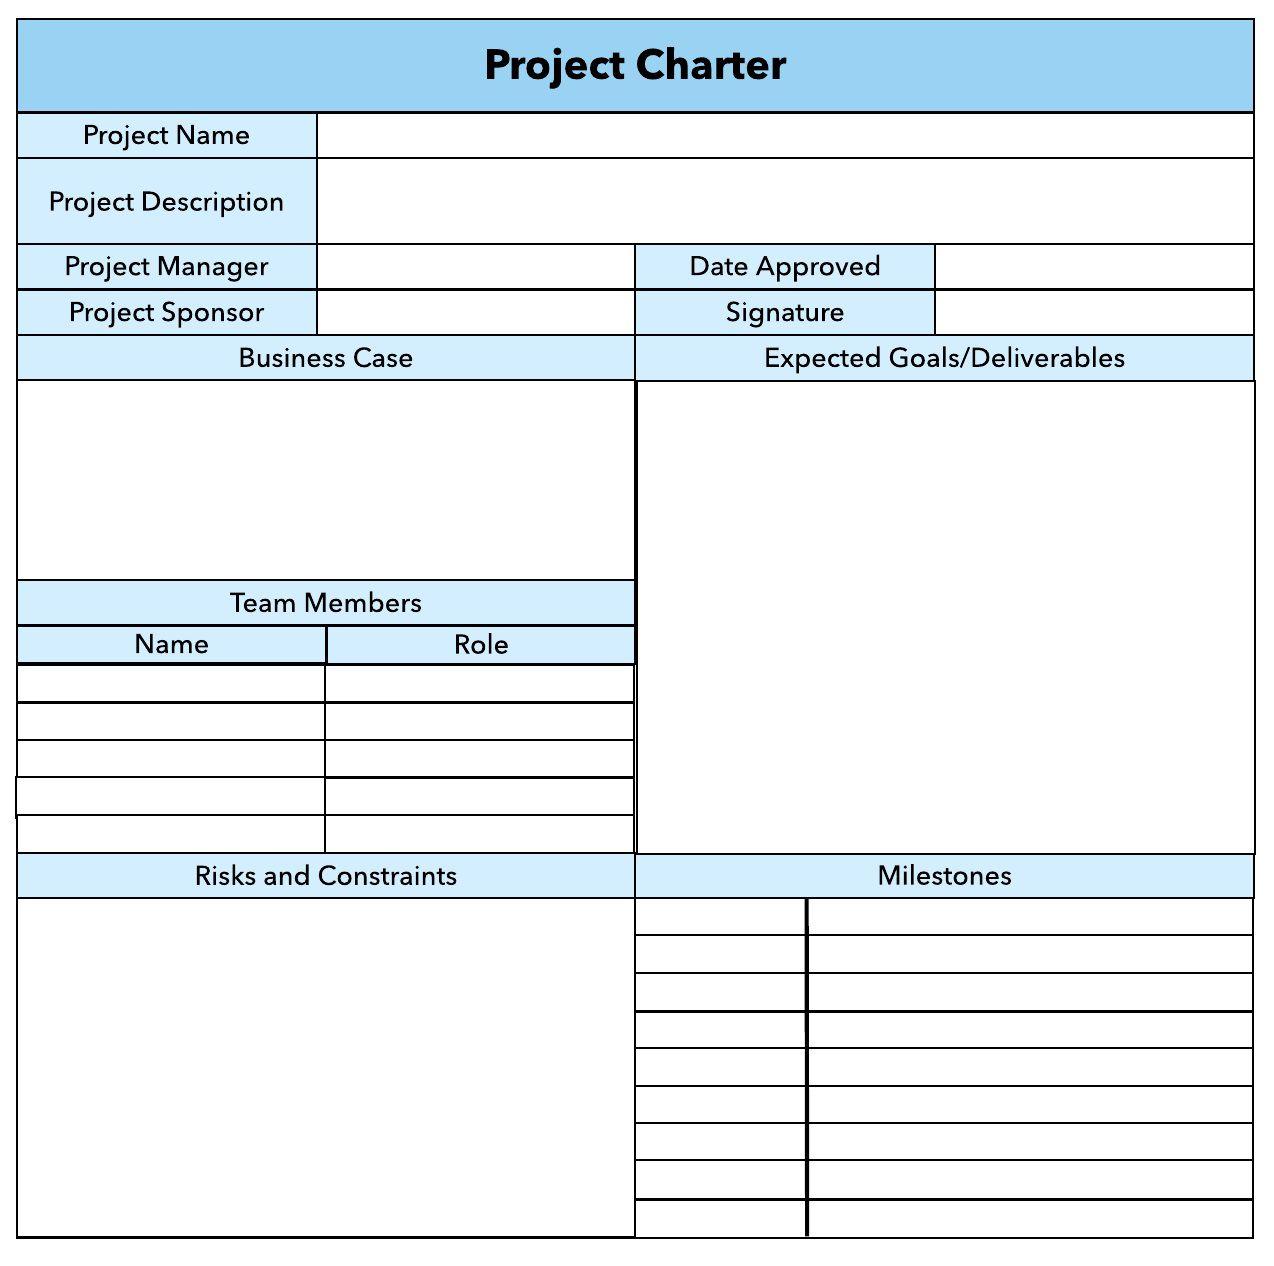 007 Unique Project Charter Template Excel Photo  Lean Pmbok NederlandFull